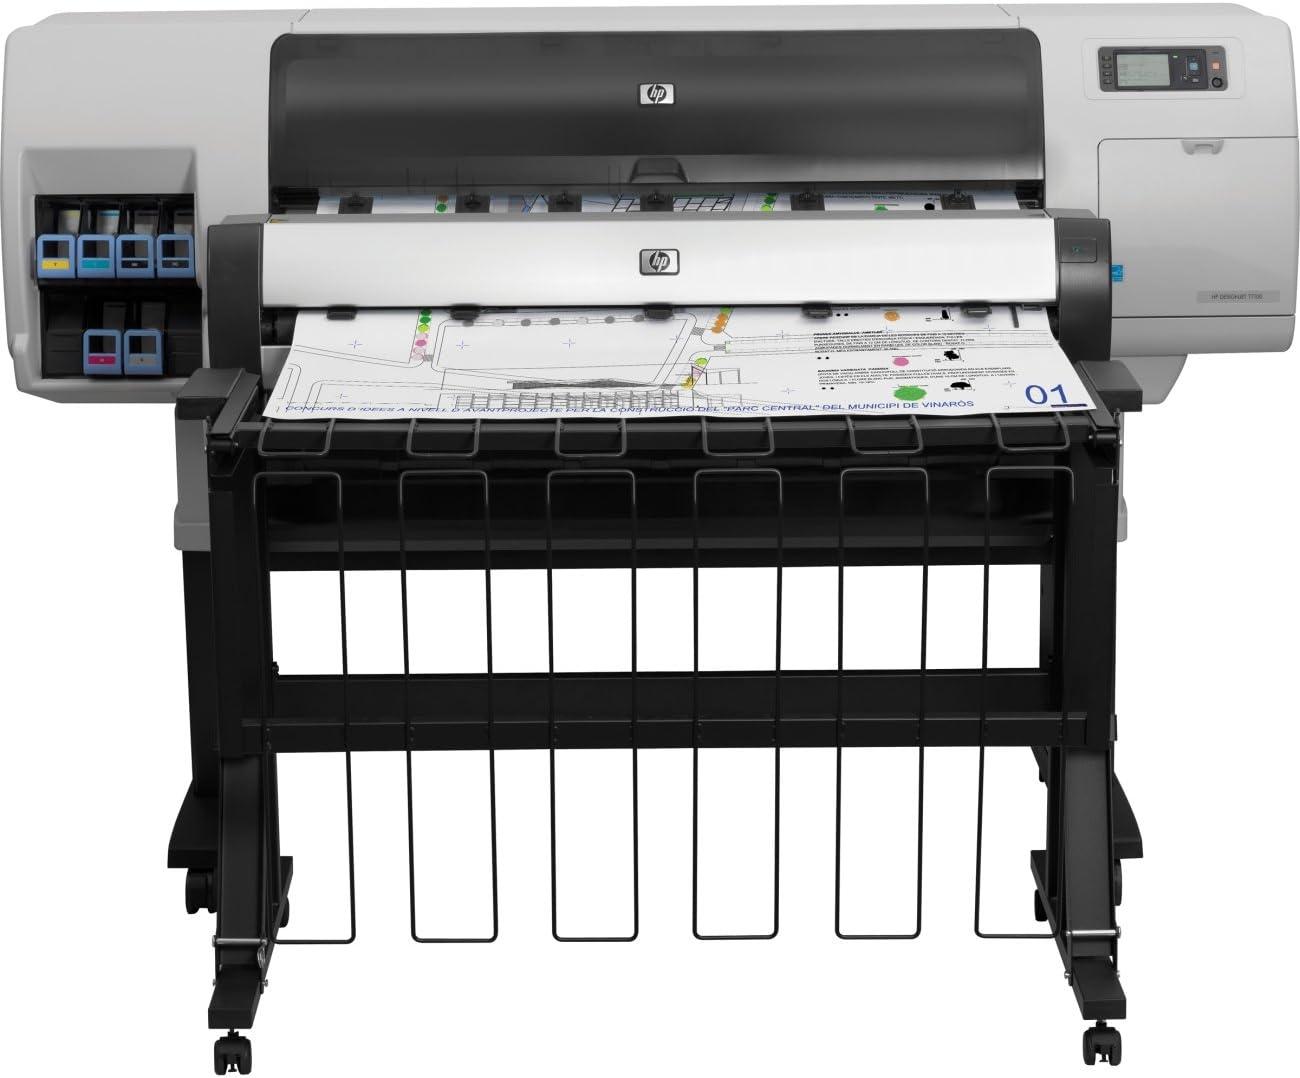 HP Designjet T7100 Printer - Impresora de gran formato (165 pph ...